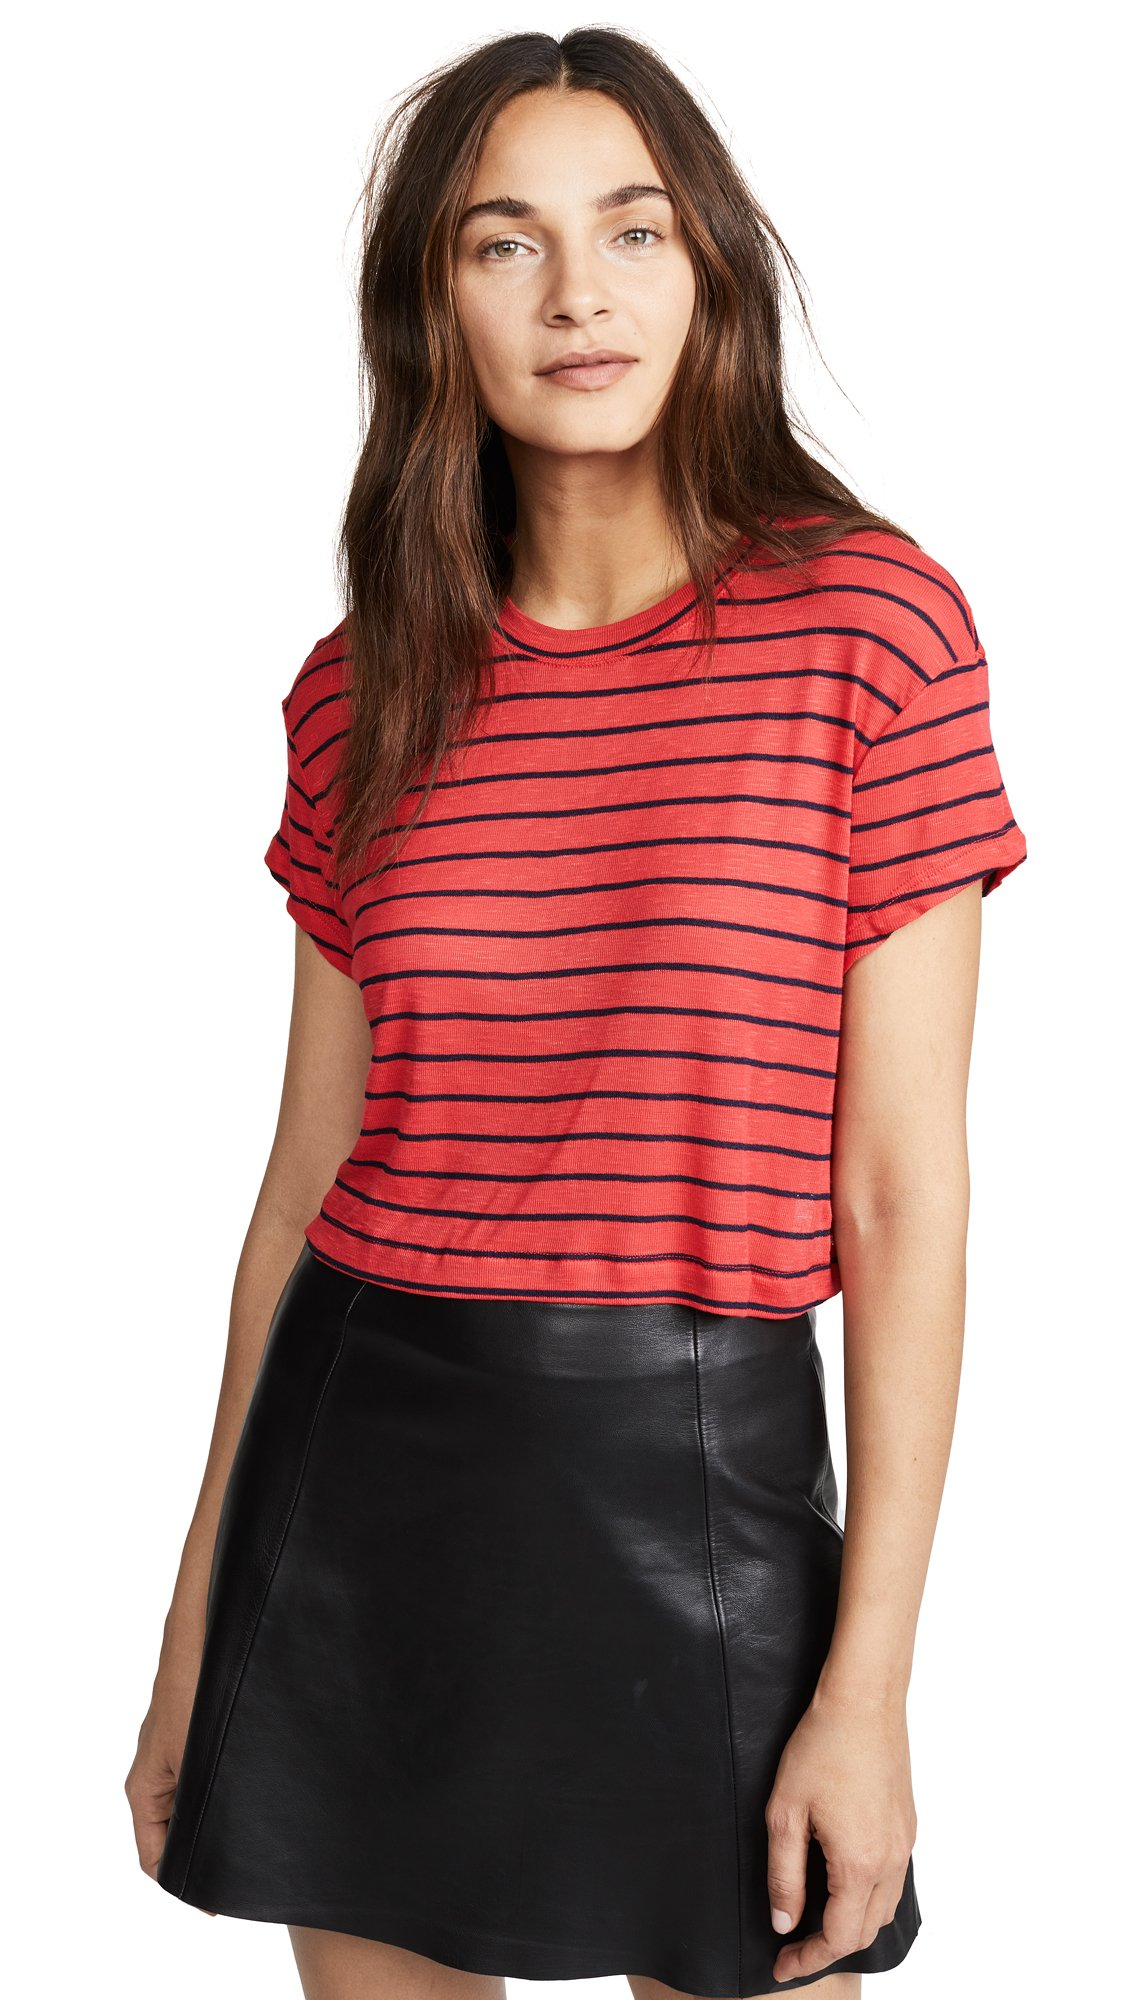 Splendid Women's Striped Crop Top, Roja/Navy, M